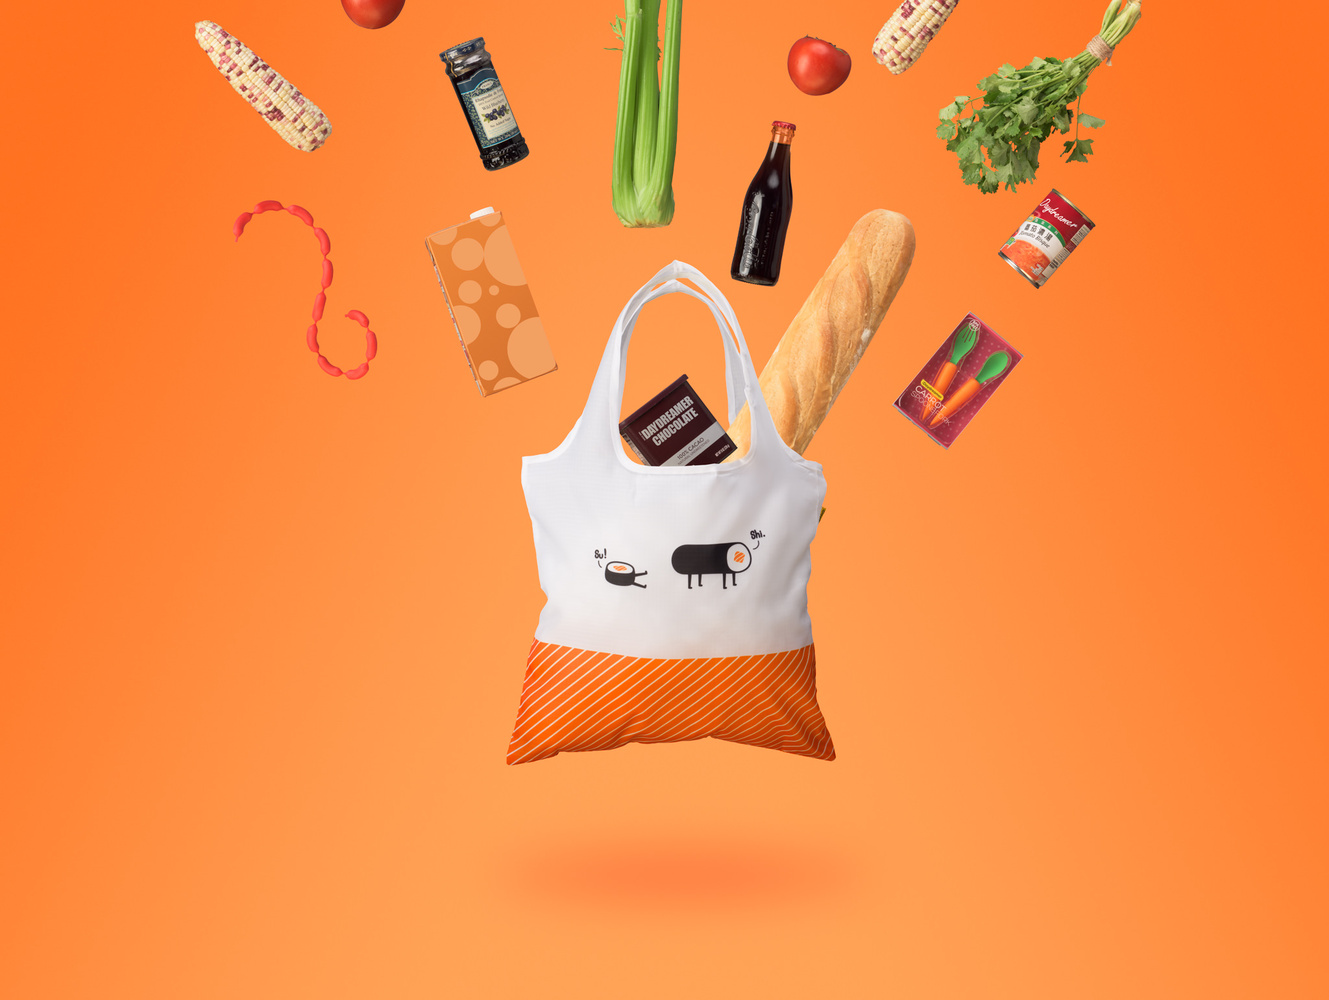 Reusable shopping bag Hero Shot by Brenden King